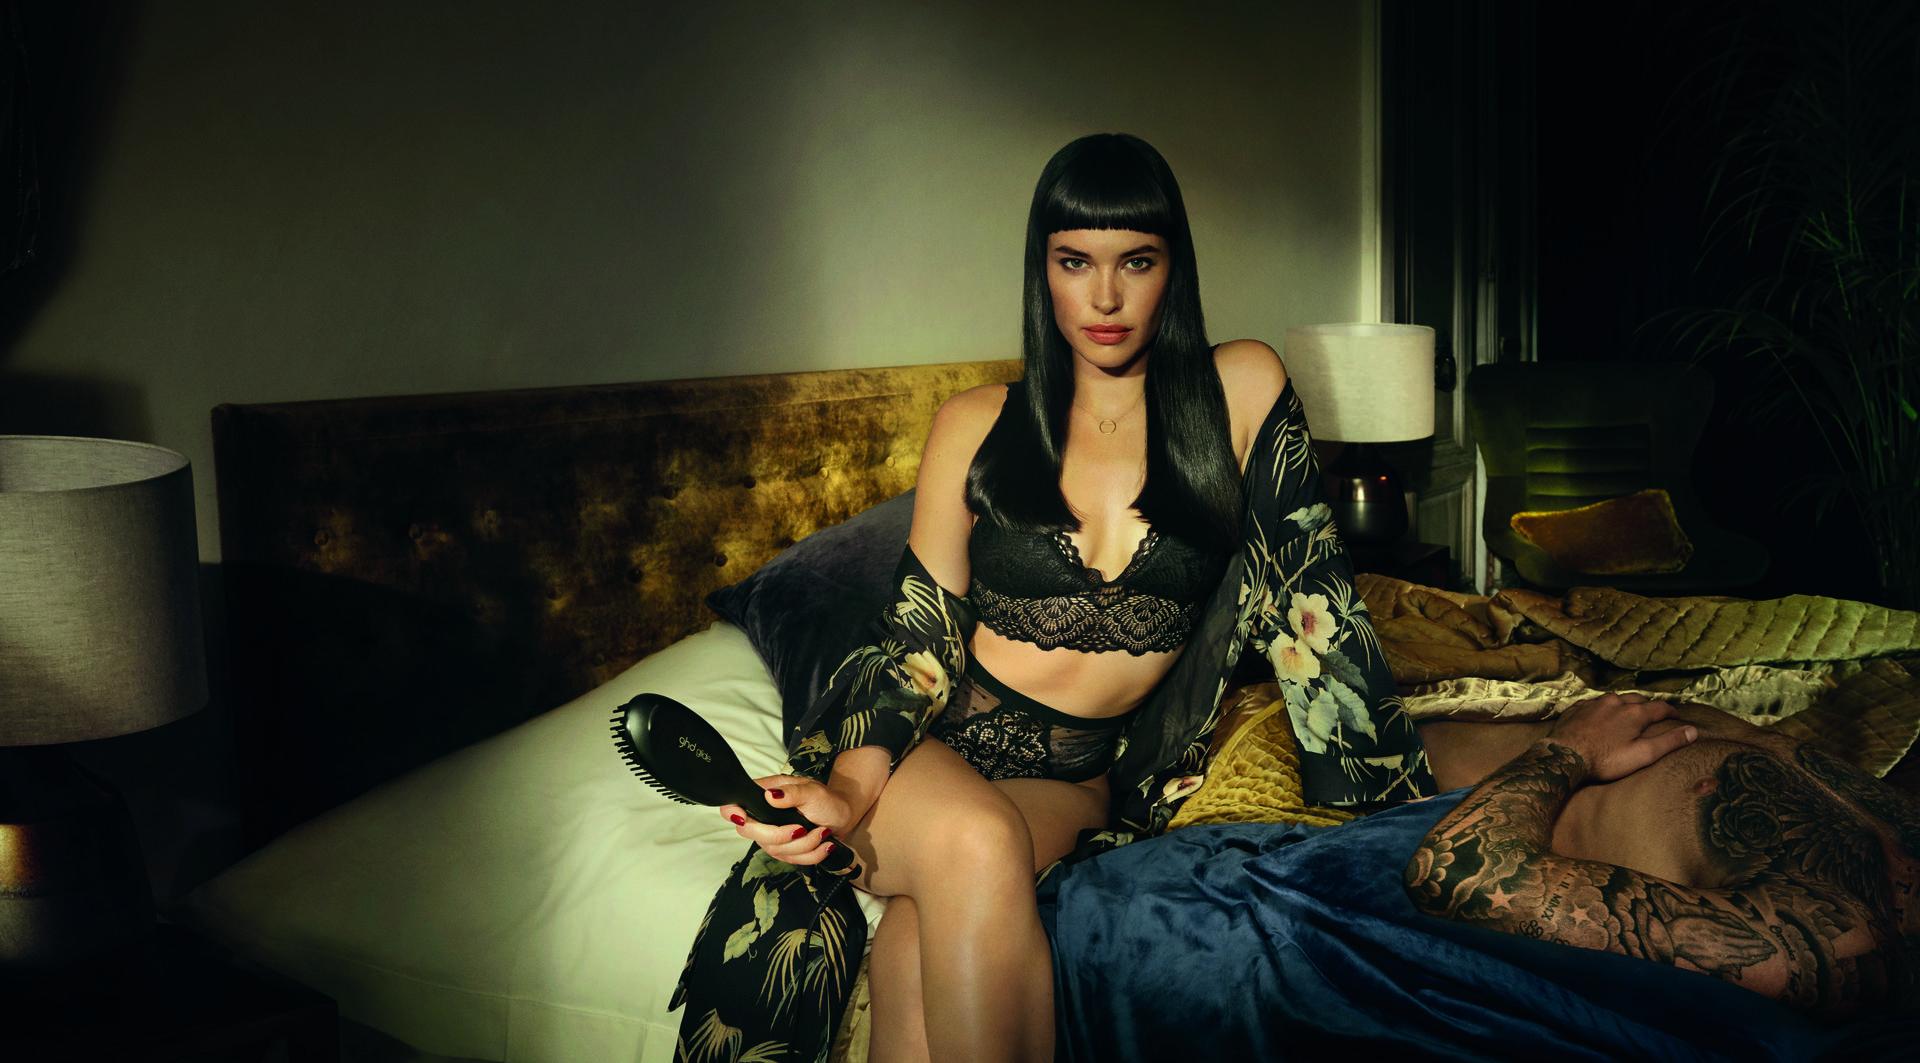 Thea Carly female model photoshoot for GHD Bridge Models London